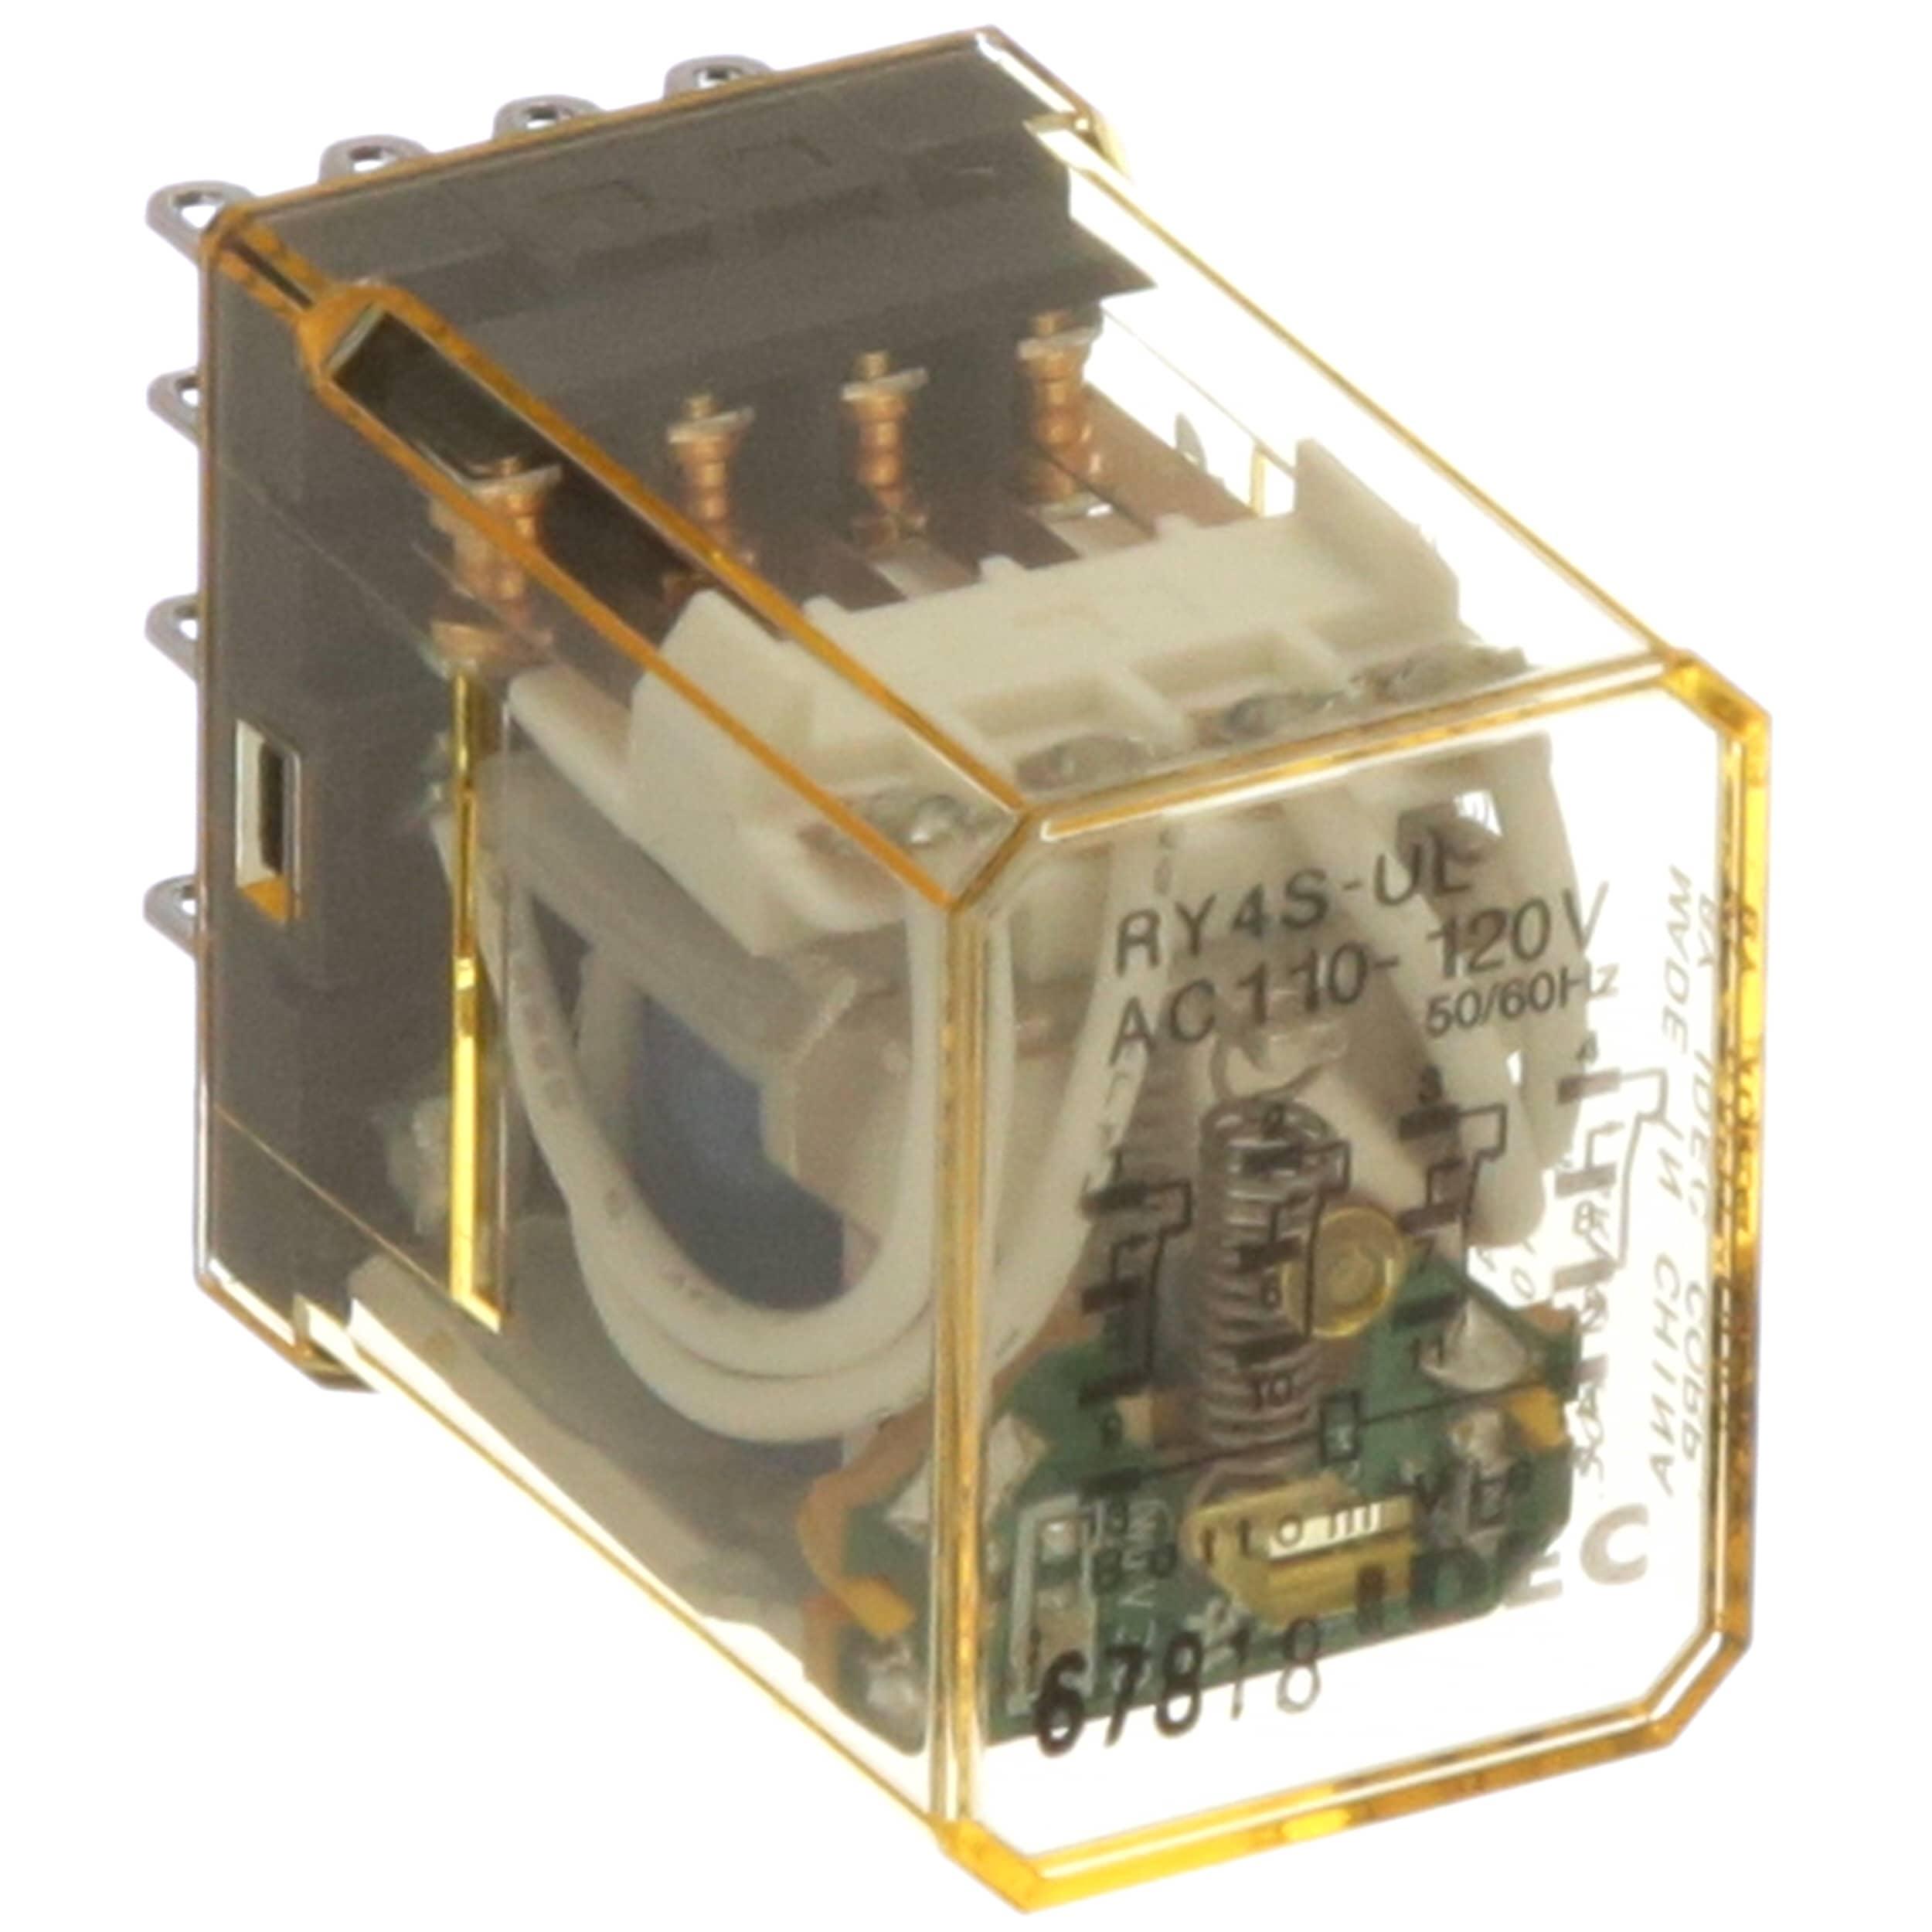 IDEC Corporation - RY4S-ULAC110-120V - Relay; E-Mech; GenPurp; 4PDT;  Cur-Rtg5A; Ctrl-V110-120AC; Vol-Rtg 240AC; Plug-In/Solder - Allied  Electronics & ...